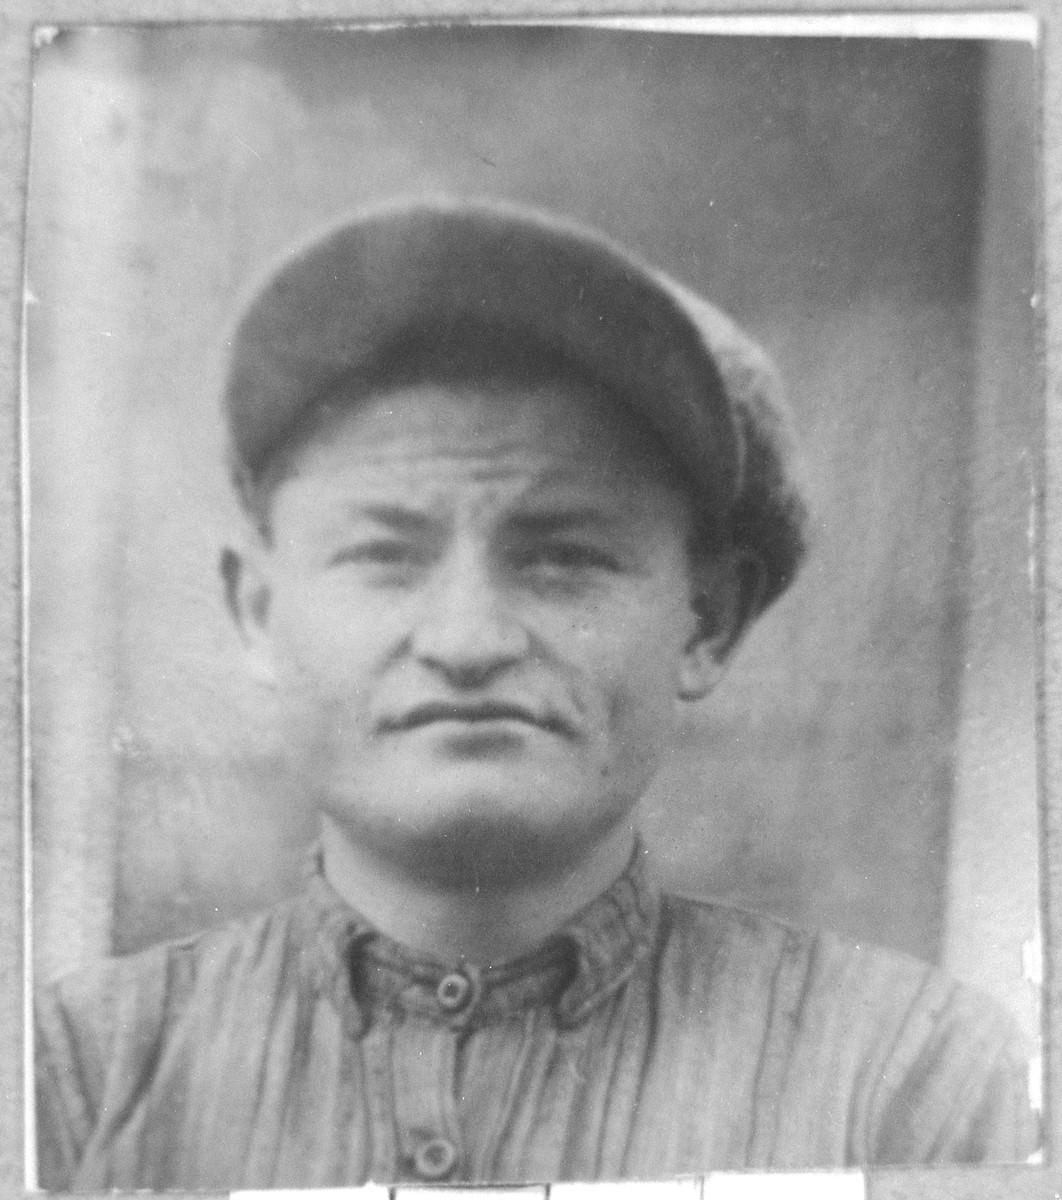 Portrait of Avram Faradji, son of David Faradji.  He was a carpenter.